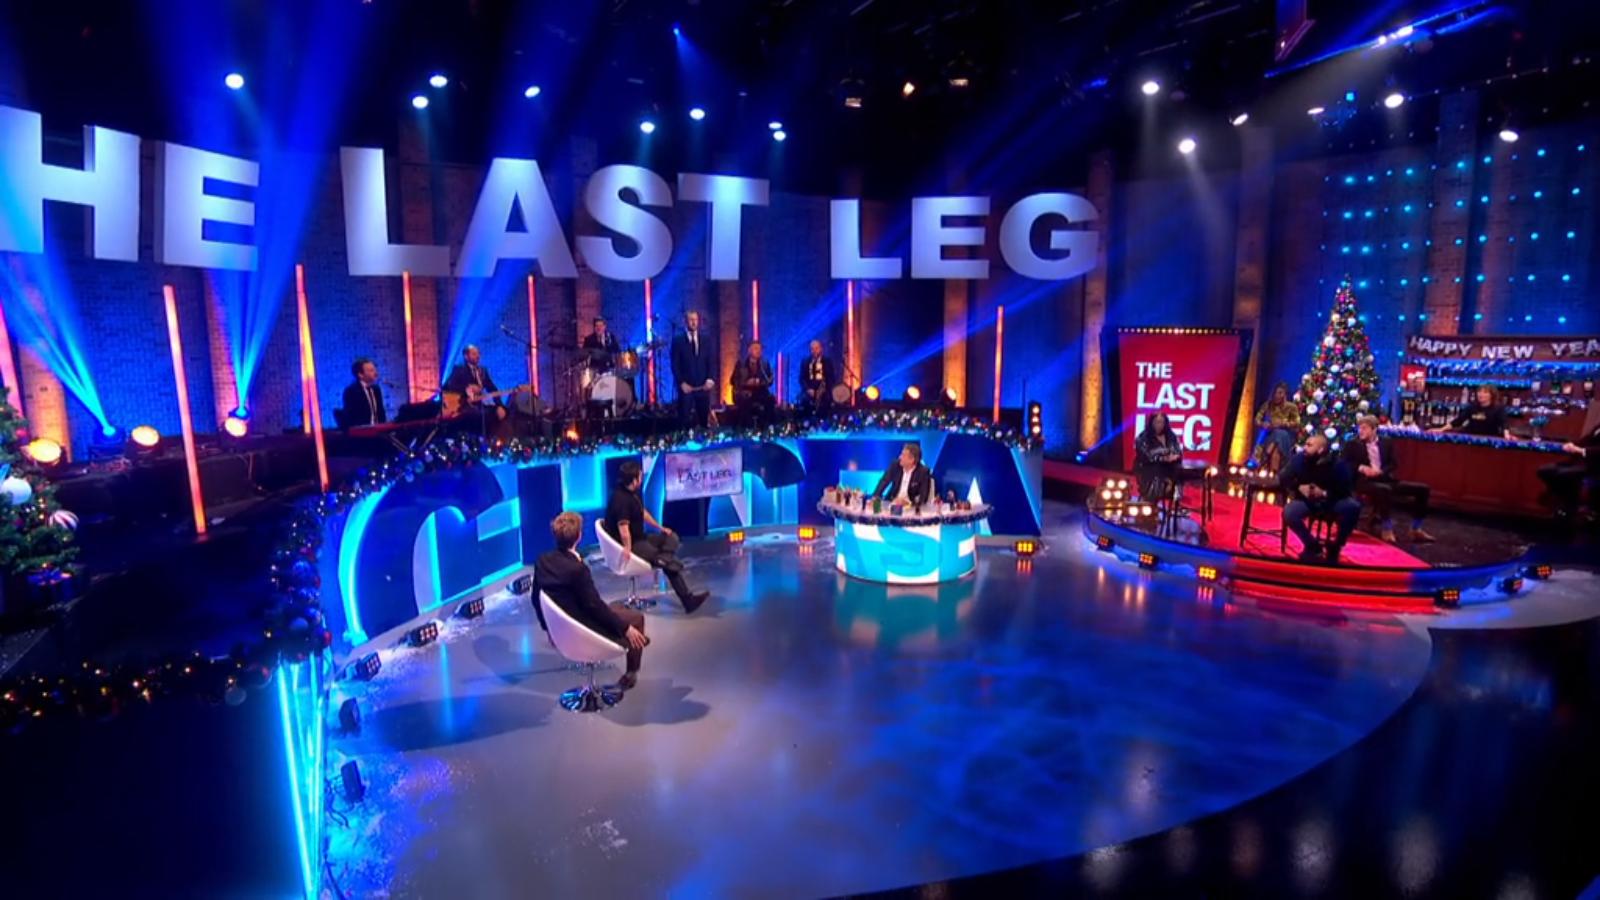 Last Leg of the Year